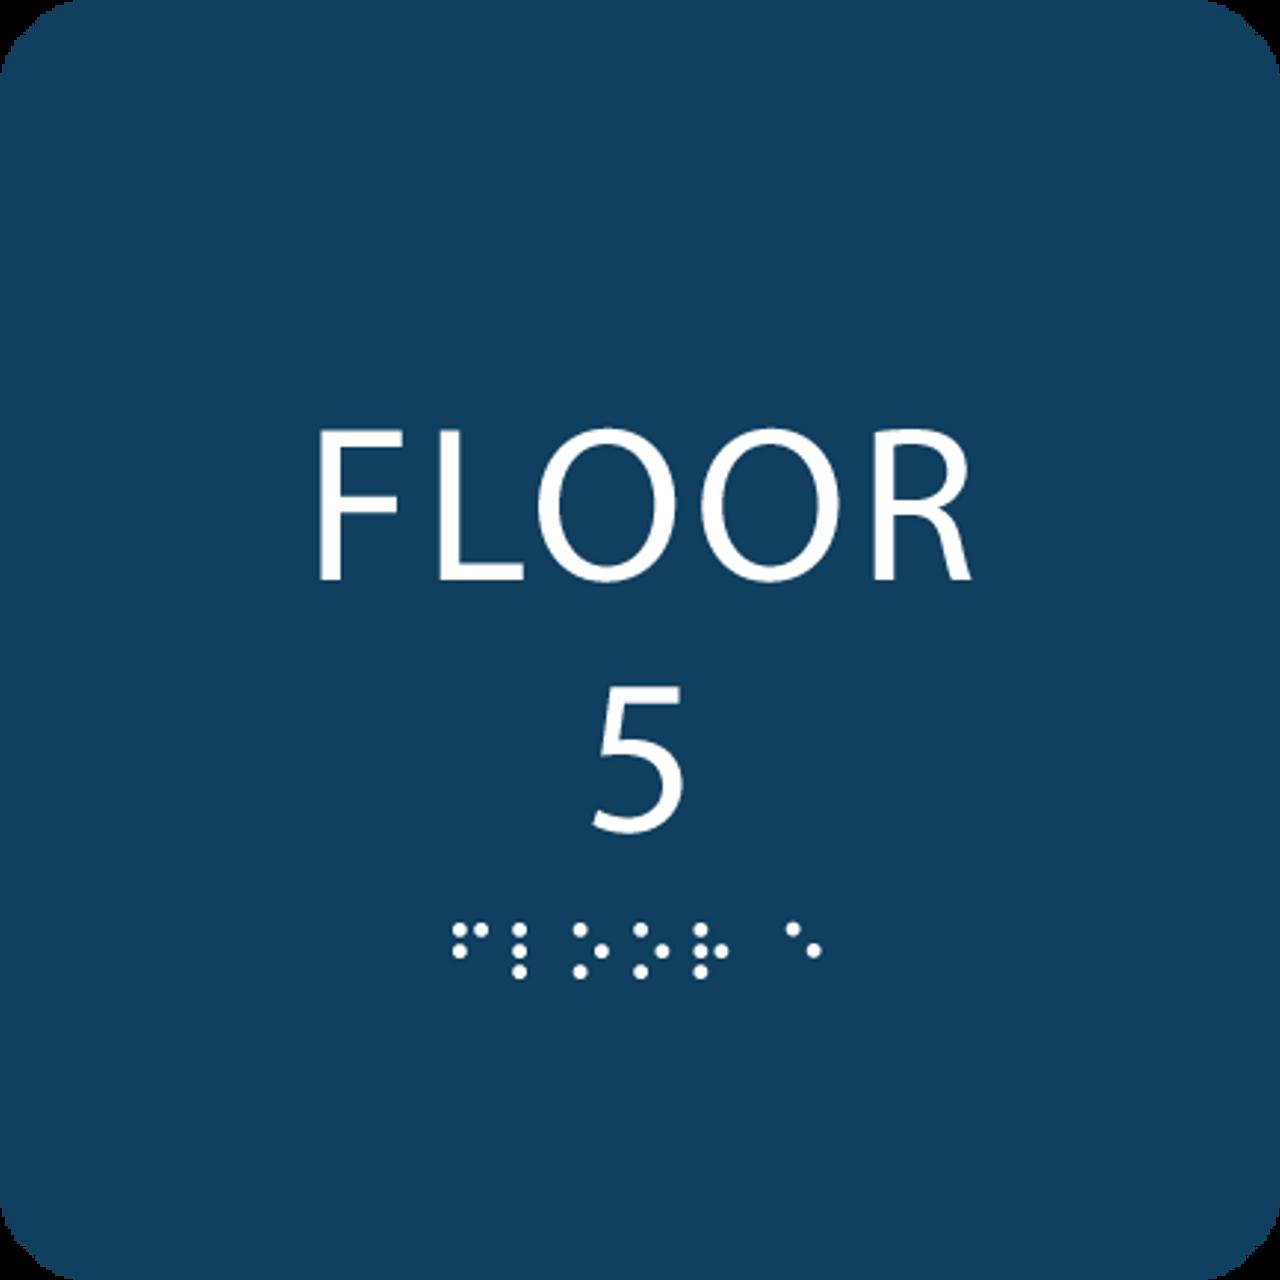 Dark Blue Floor 5 Level Identification Sign